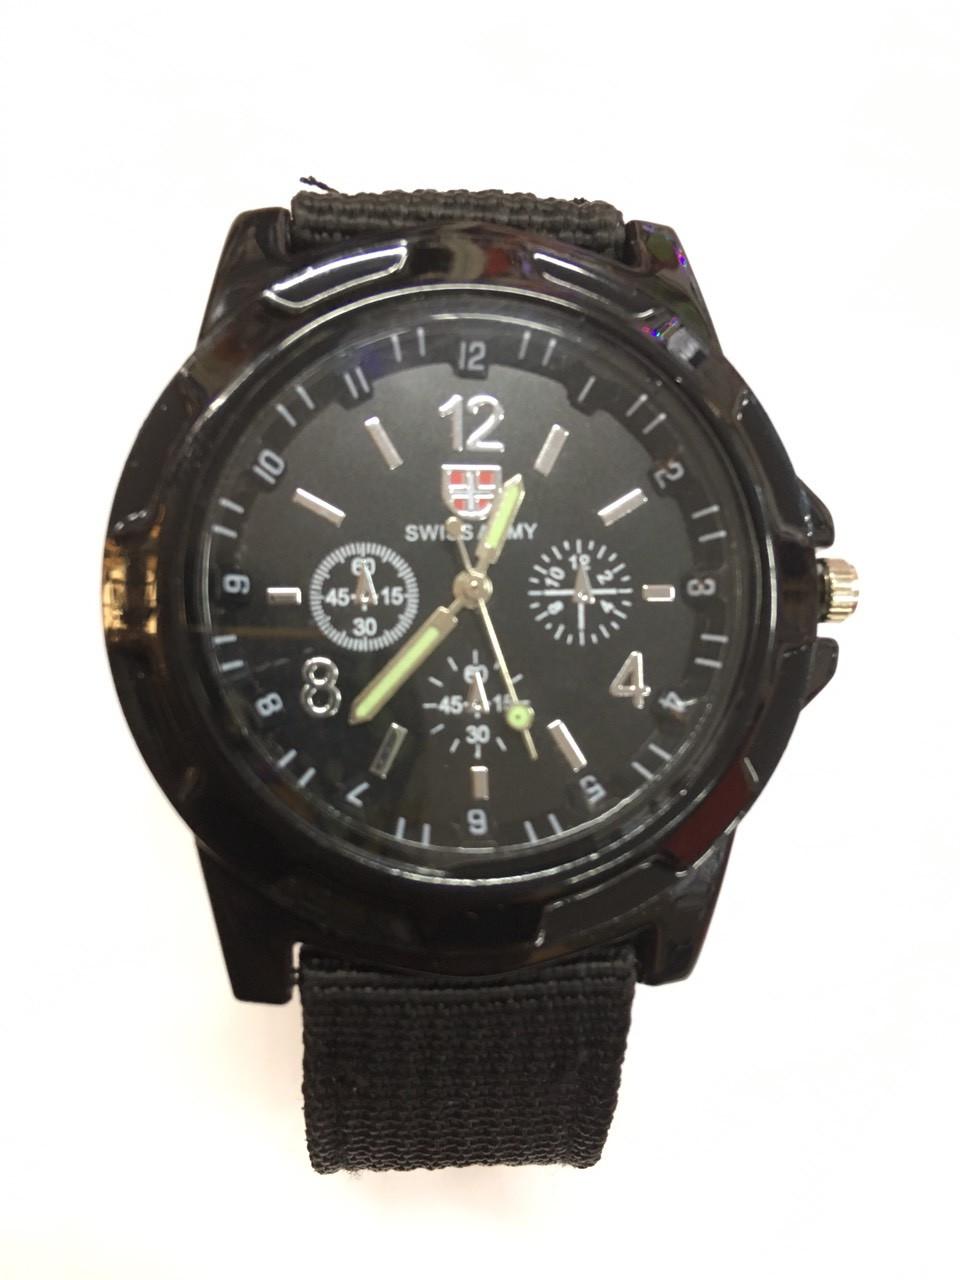 Наручный часы Swiss Army wanch EL-518/1743 (700 шт/ящ)